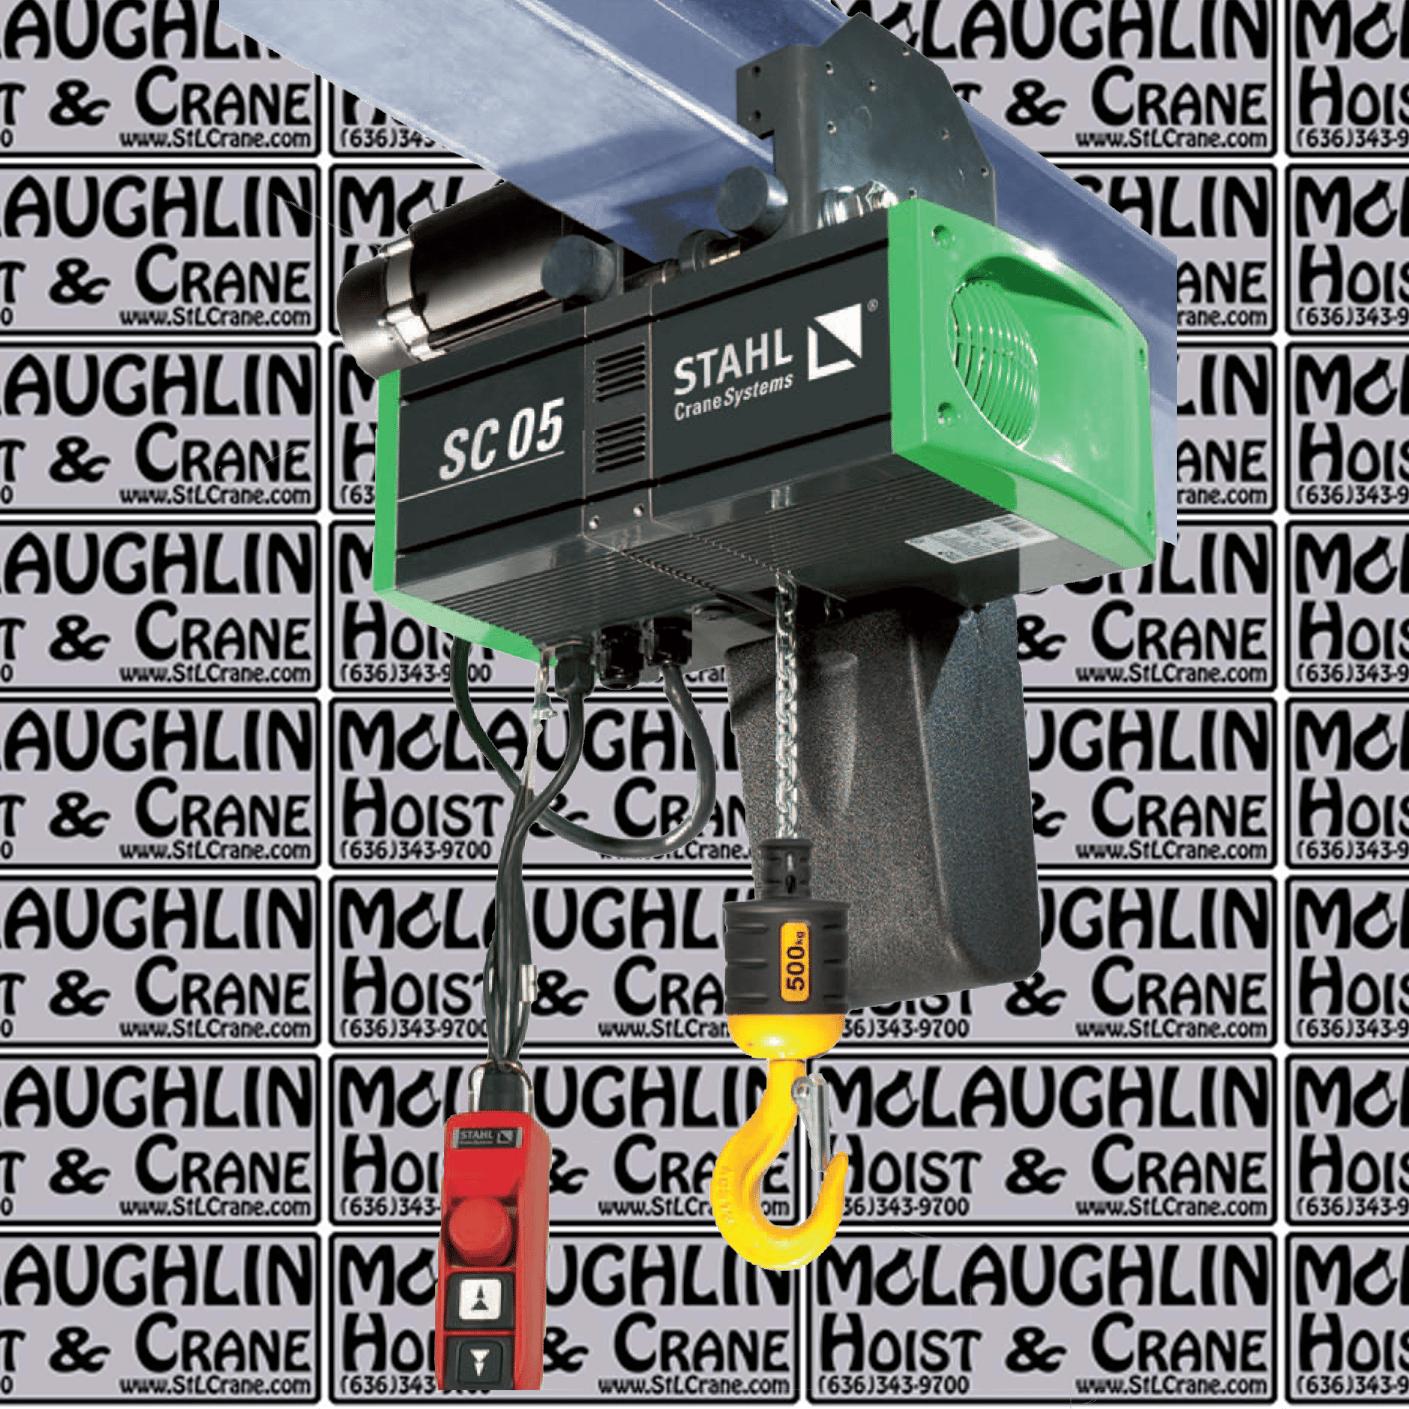 Stahl SC Chain Hoist